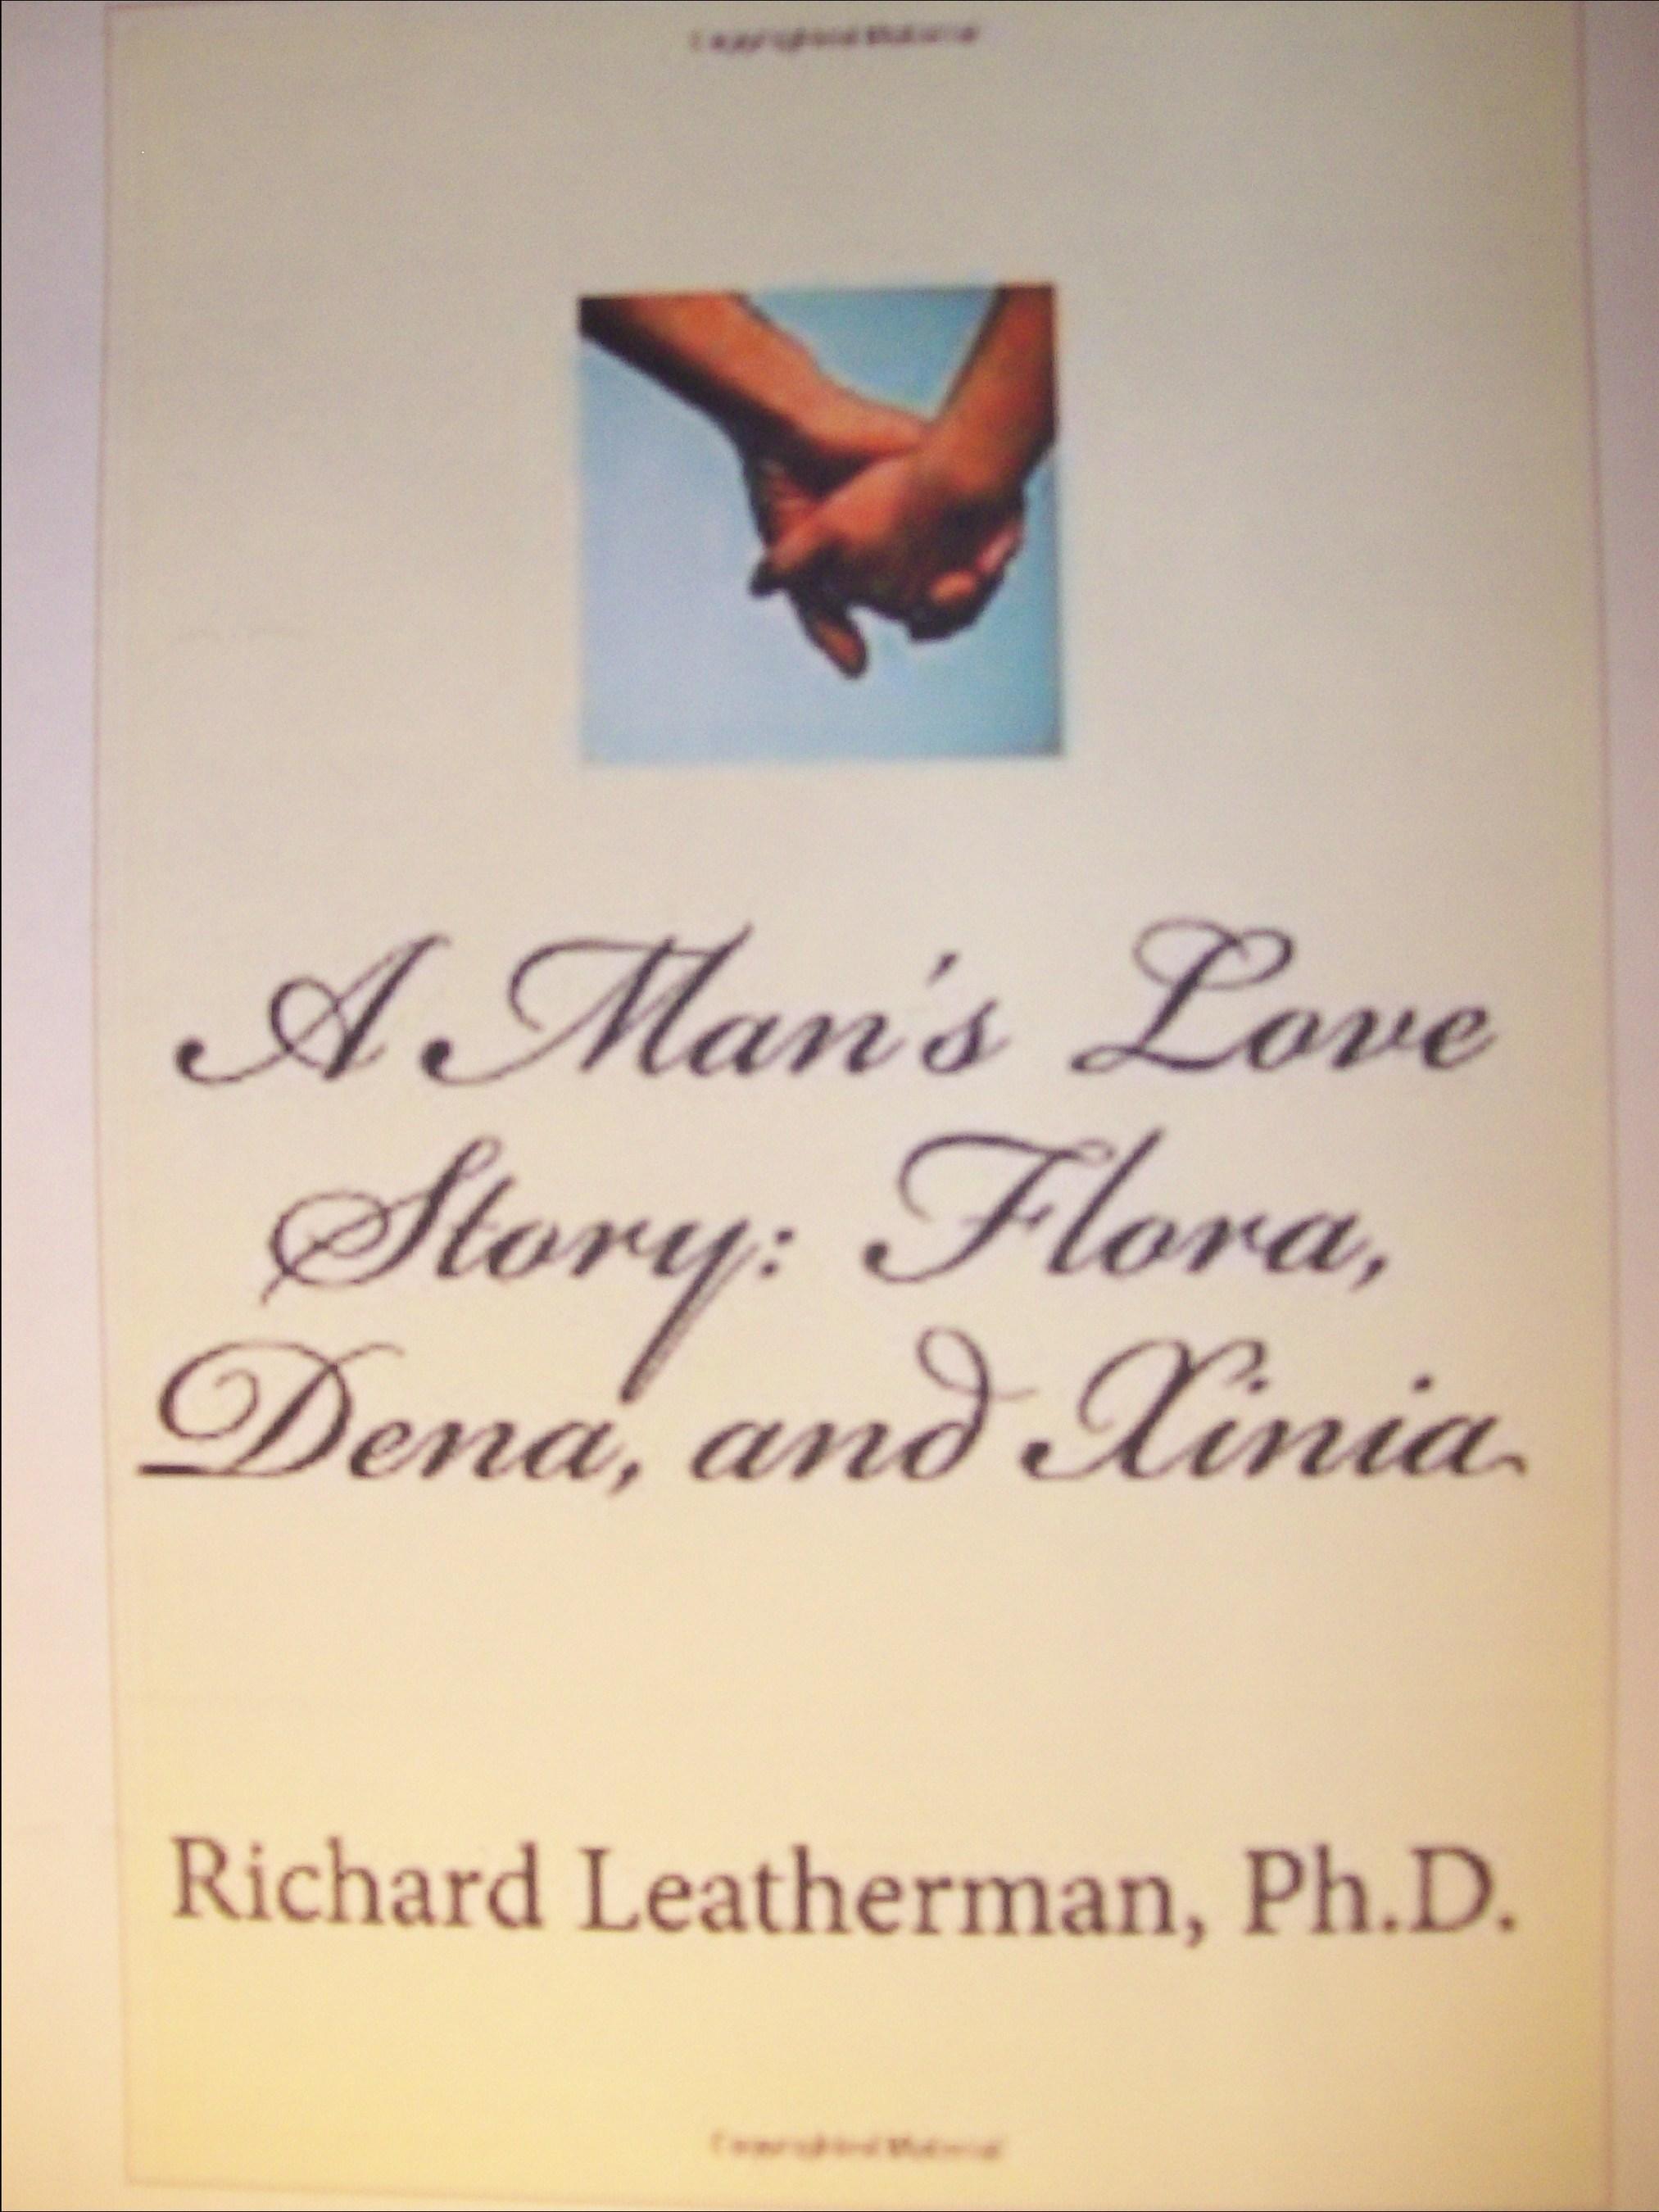 Dr. Richard Leatherman Pens A MAN'S LOVE STORY